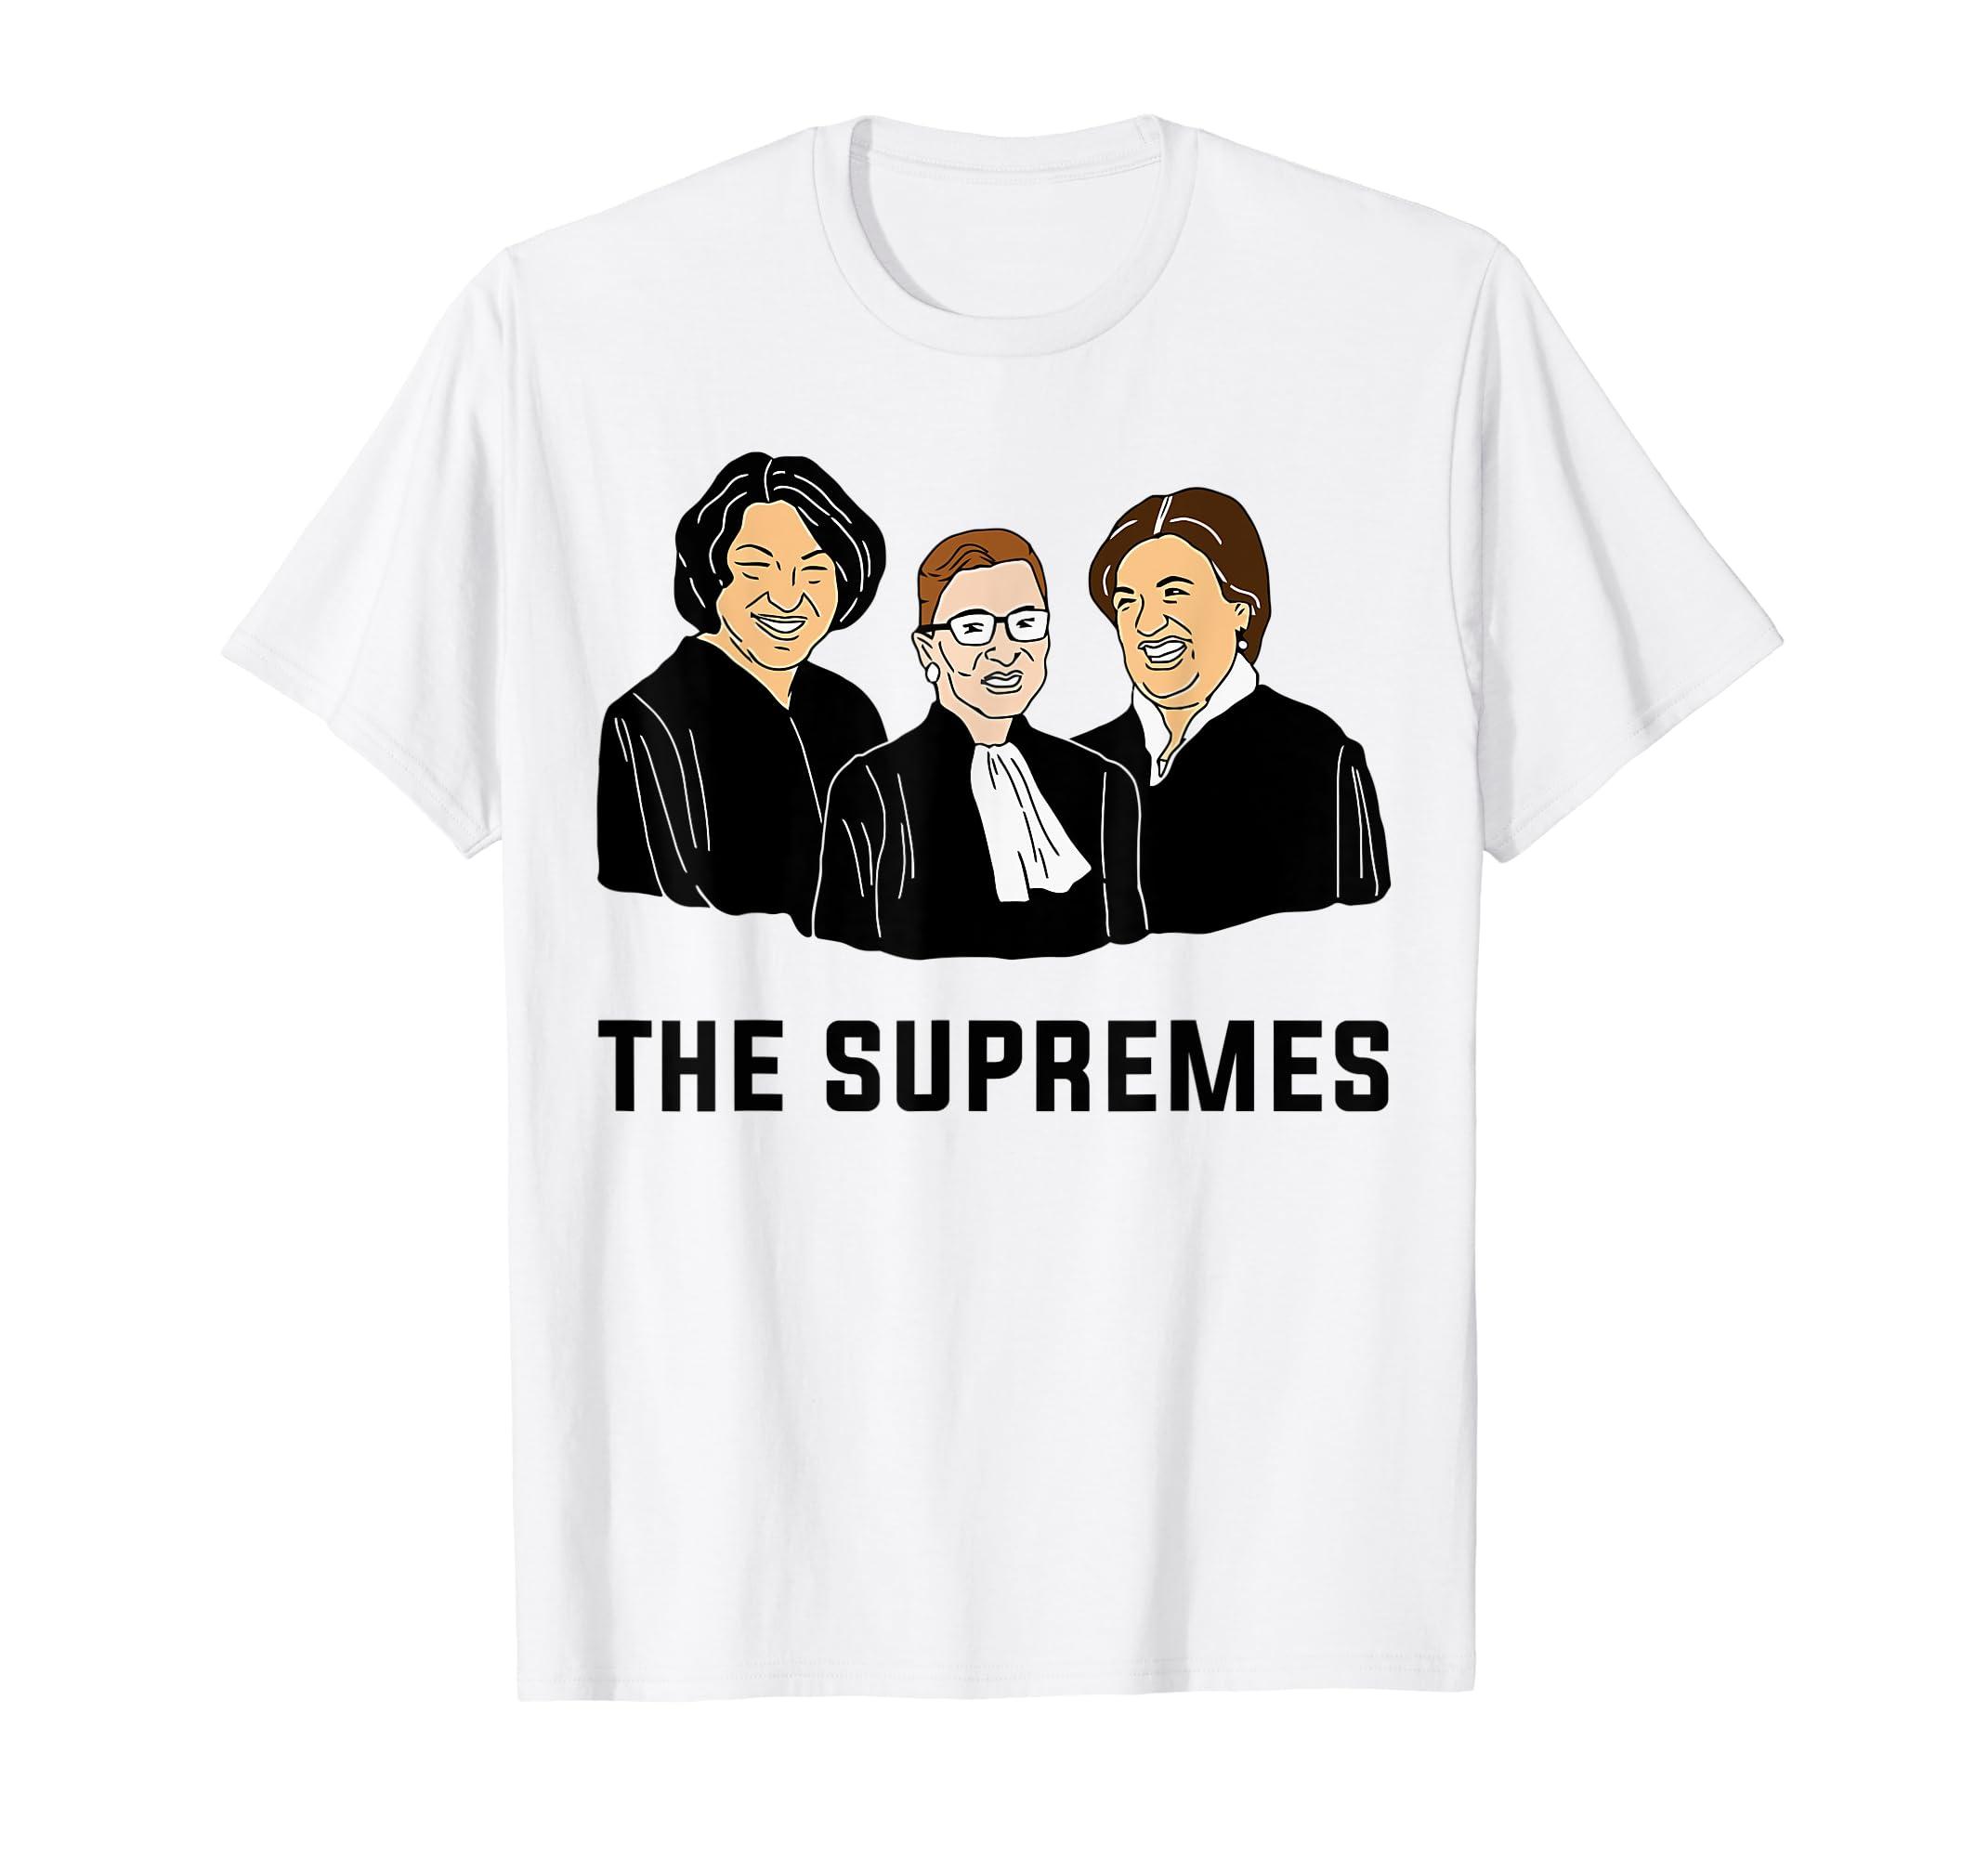 cdcf5b2ee0e3 Amazon.com: The supremes: Clothing